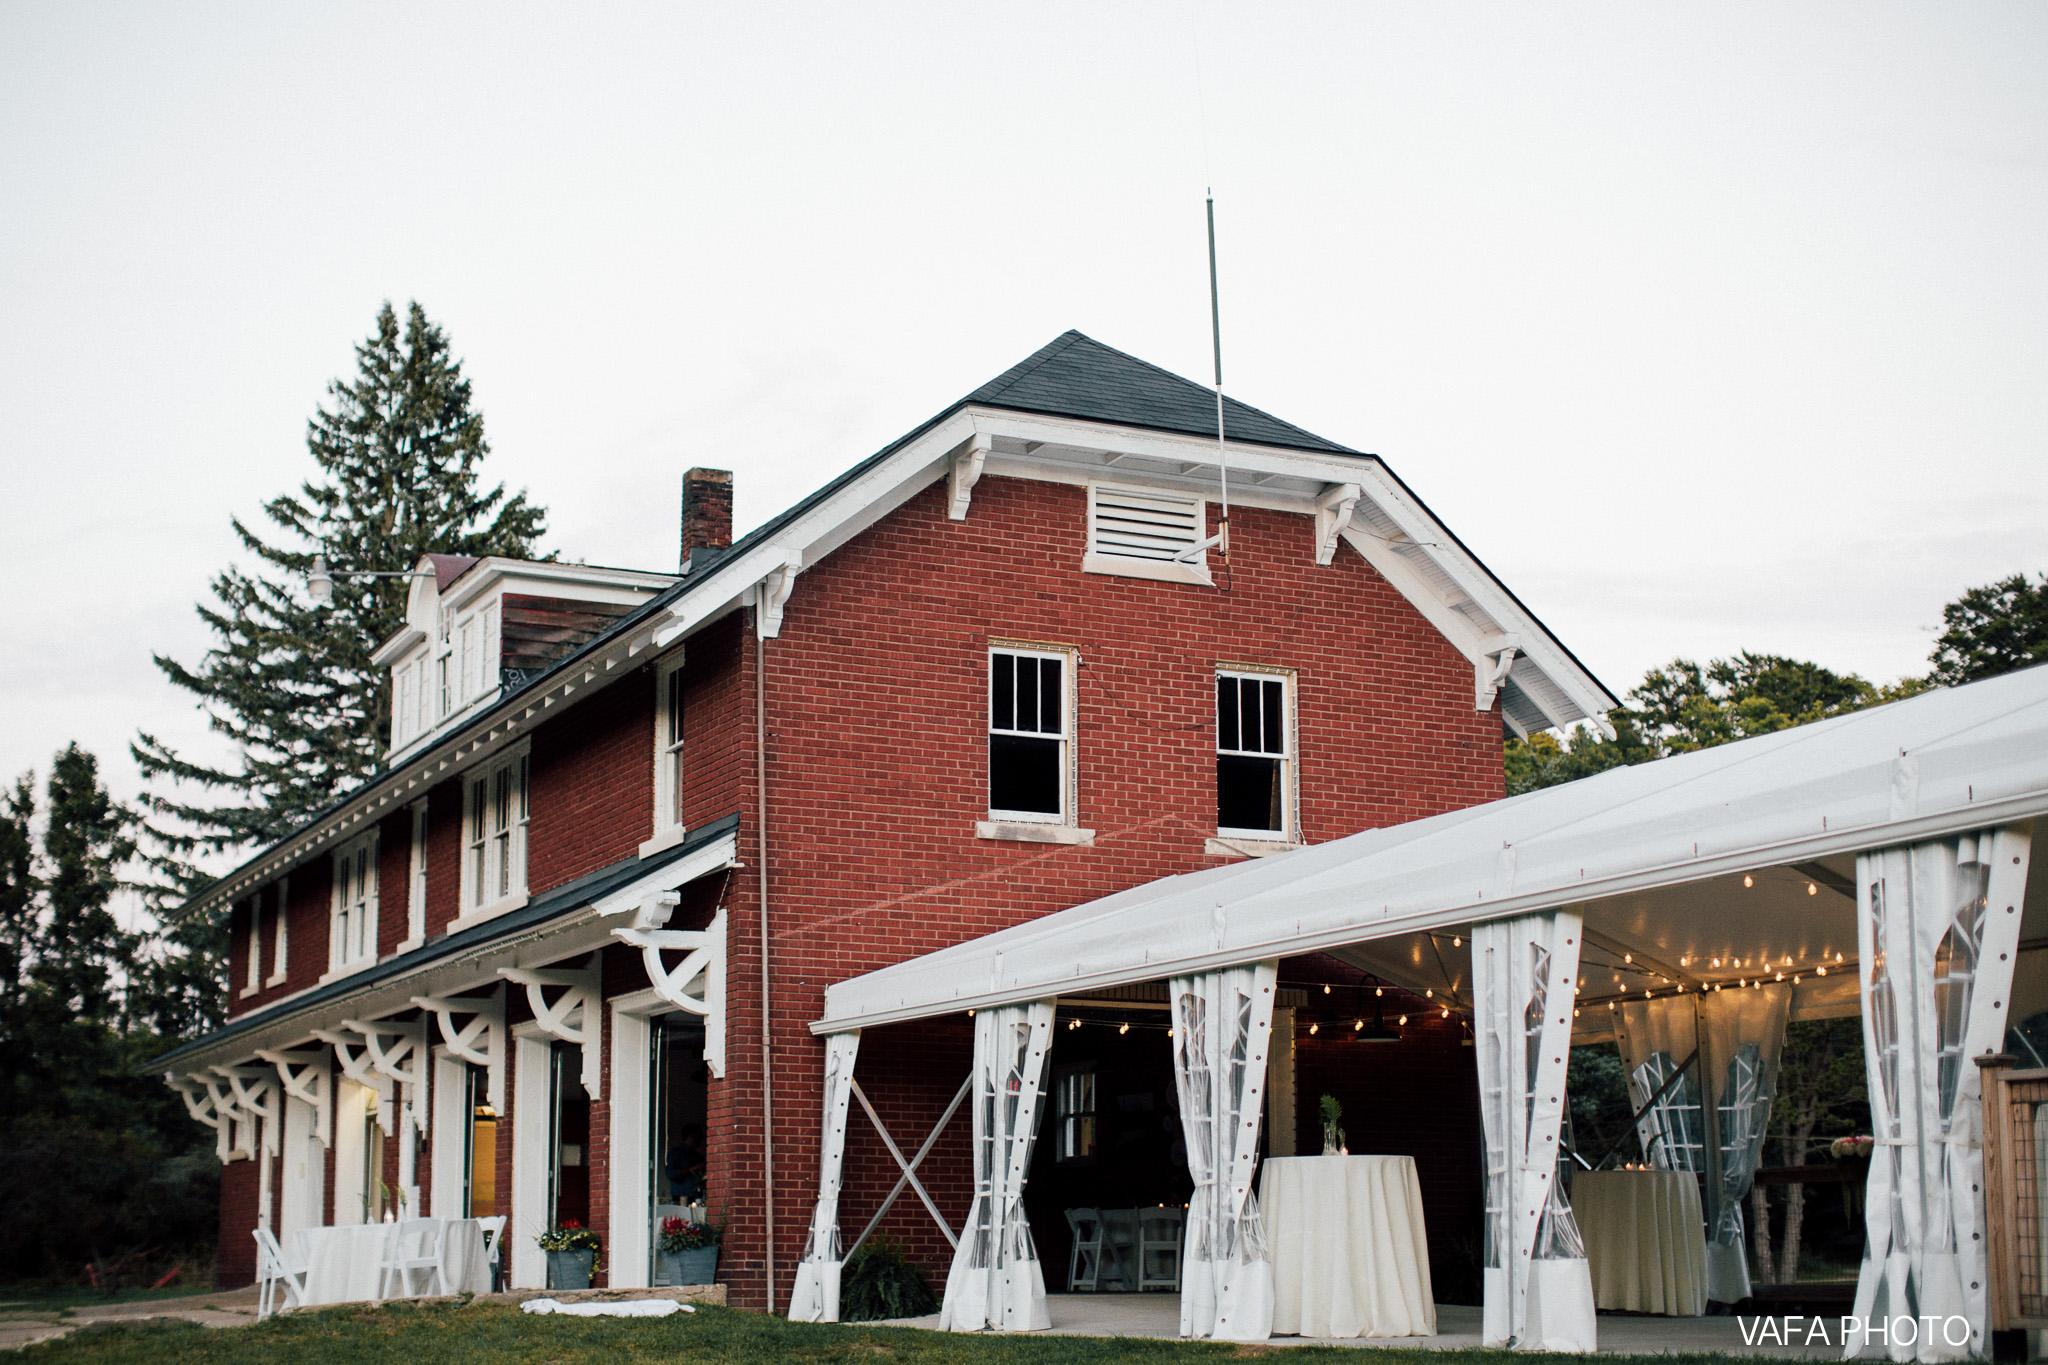 The-Felt-Estate-Wedding-Kailie-David-Vafa-Photo-854.jpg